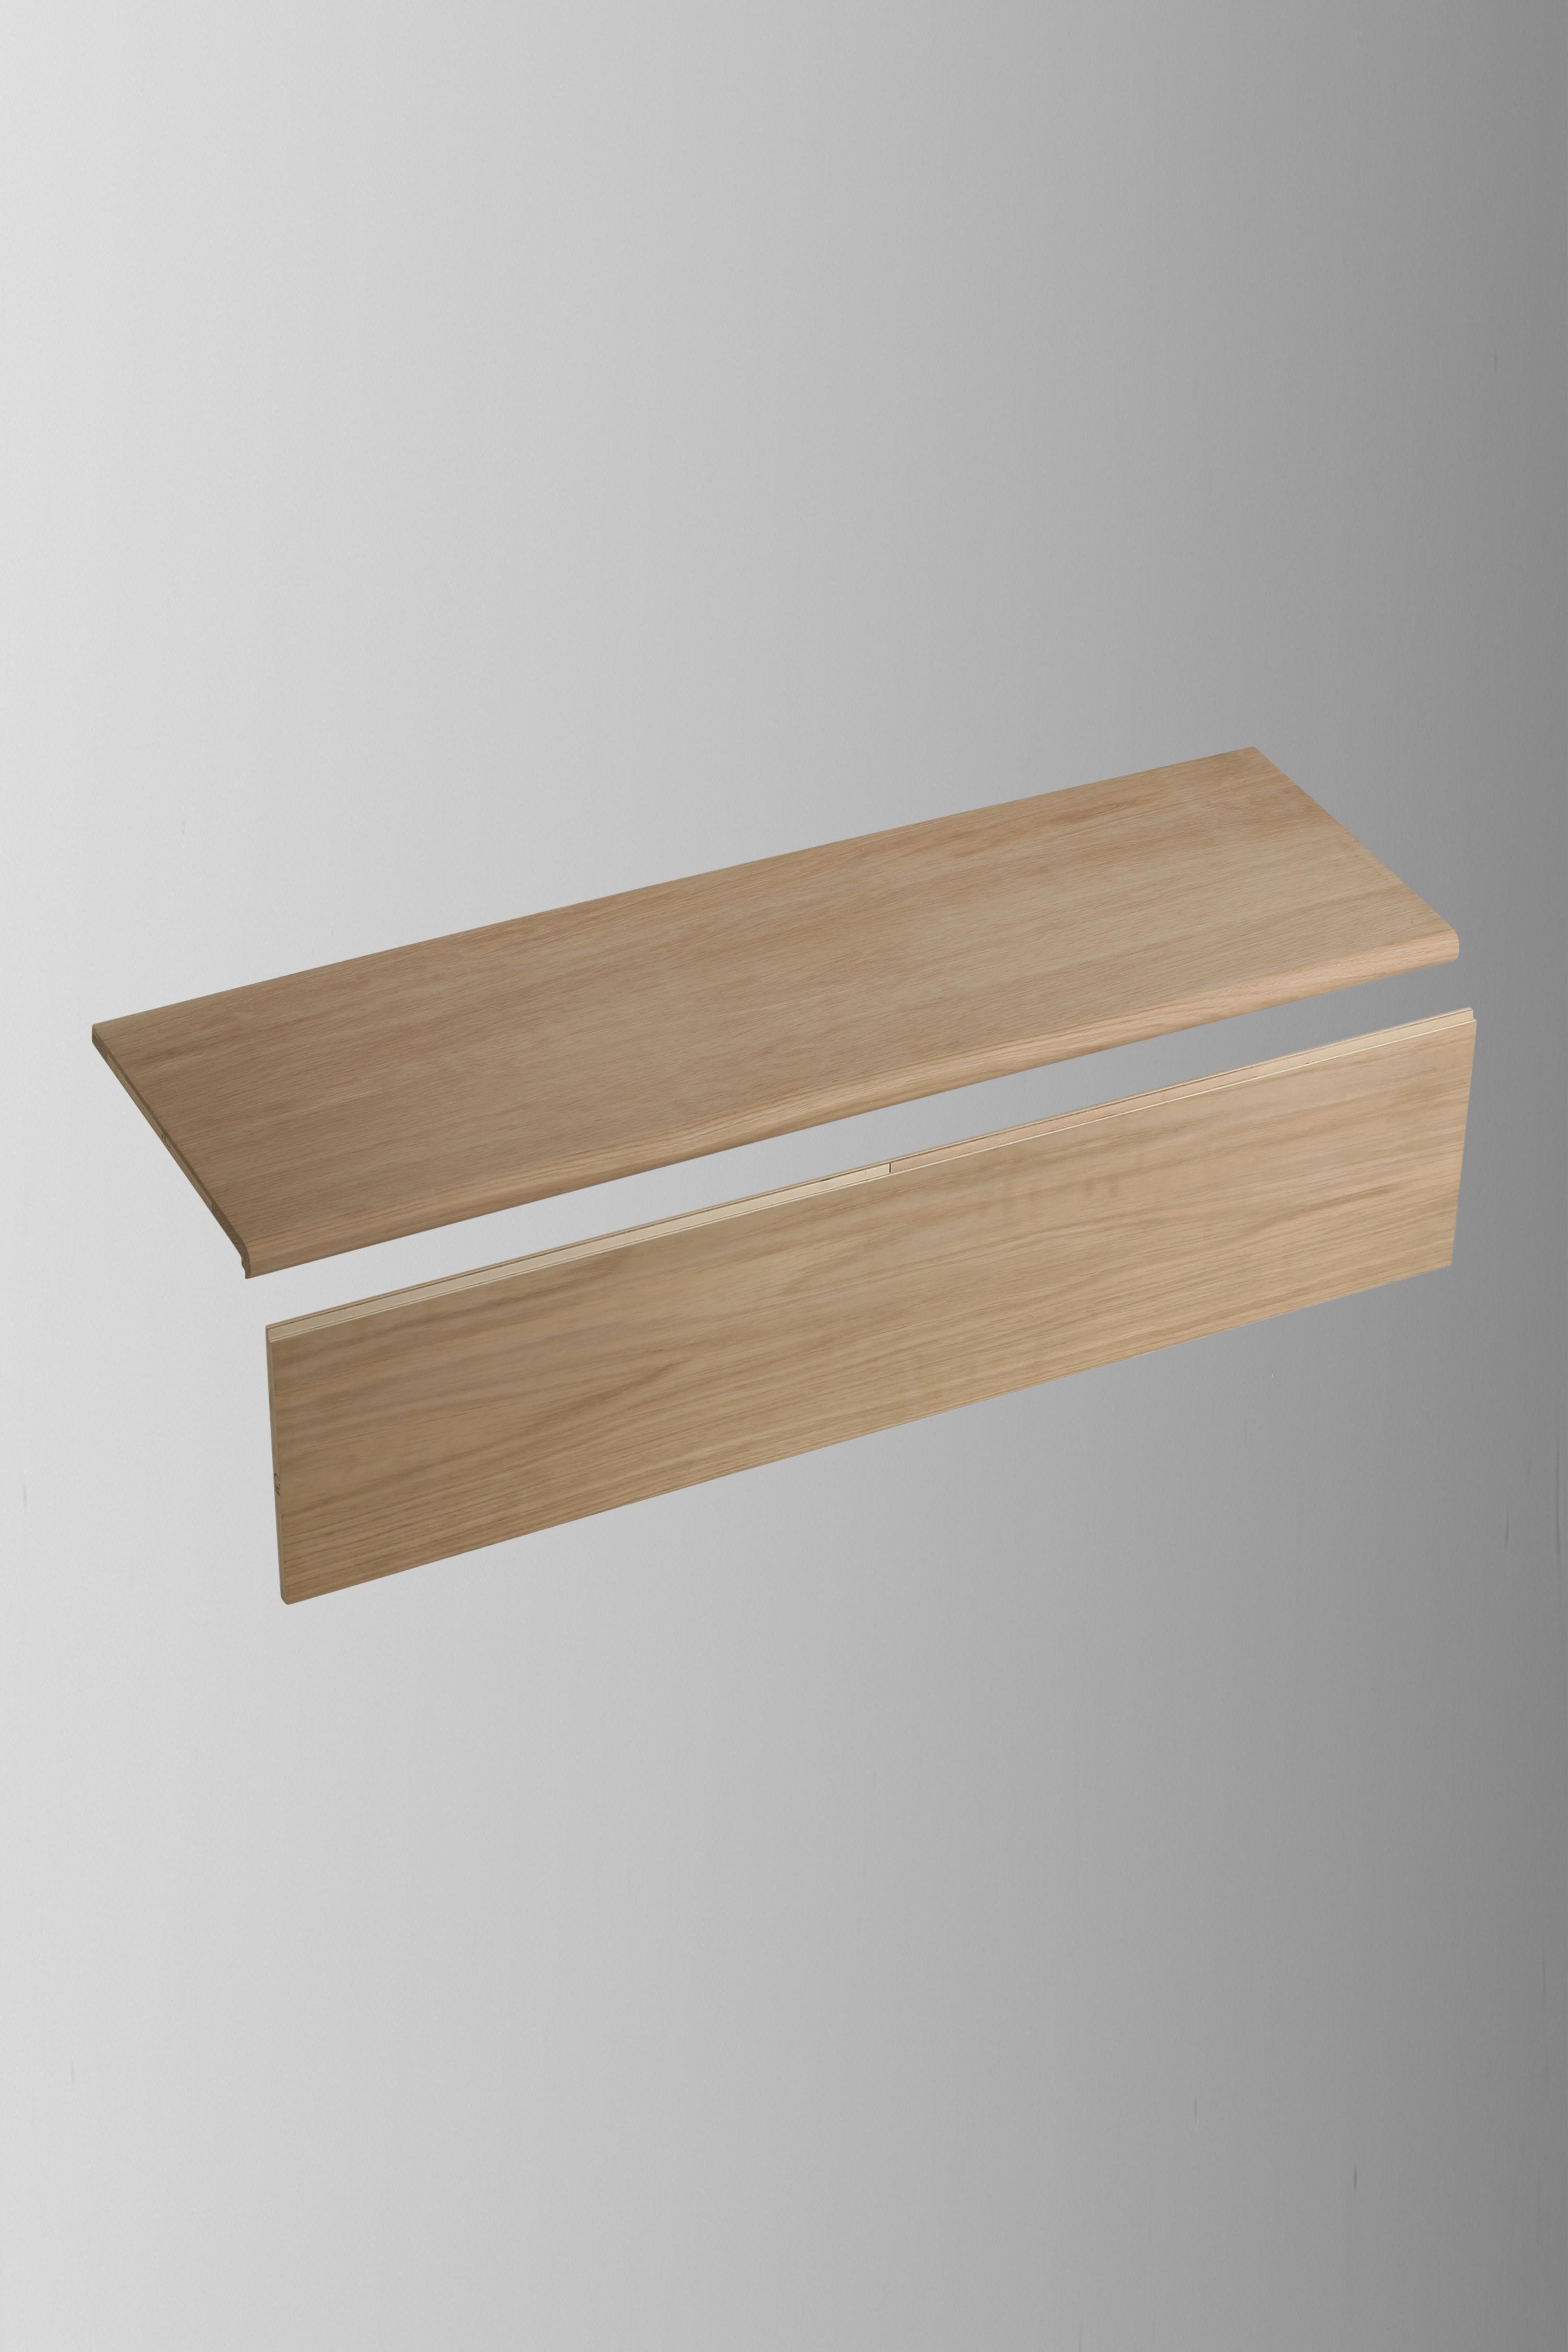 1500mm Stair Klad Oak Tread and Riser Set